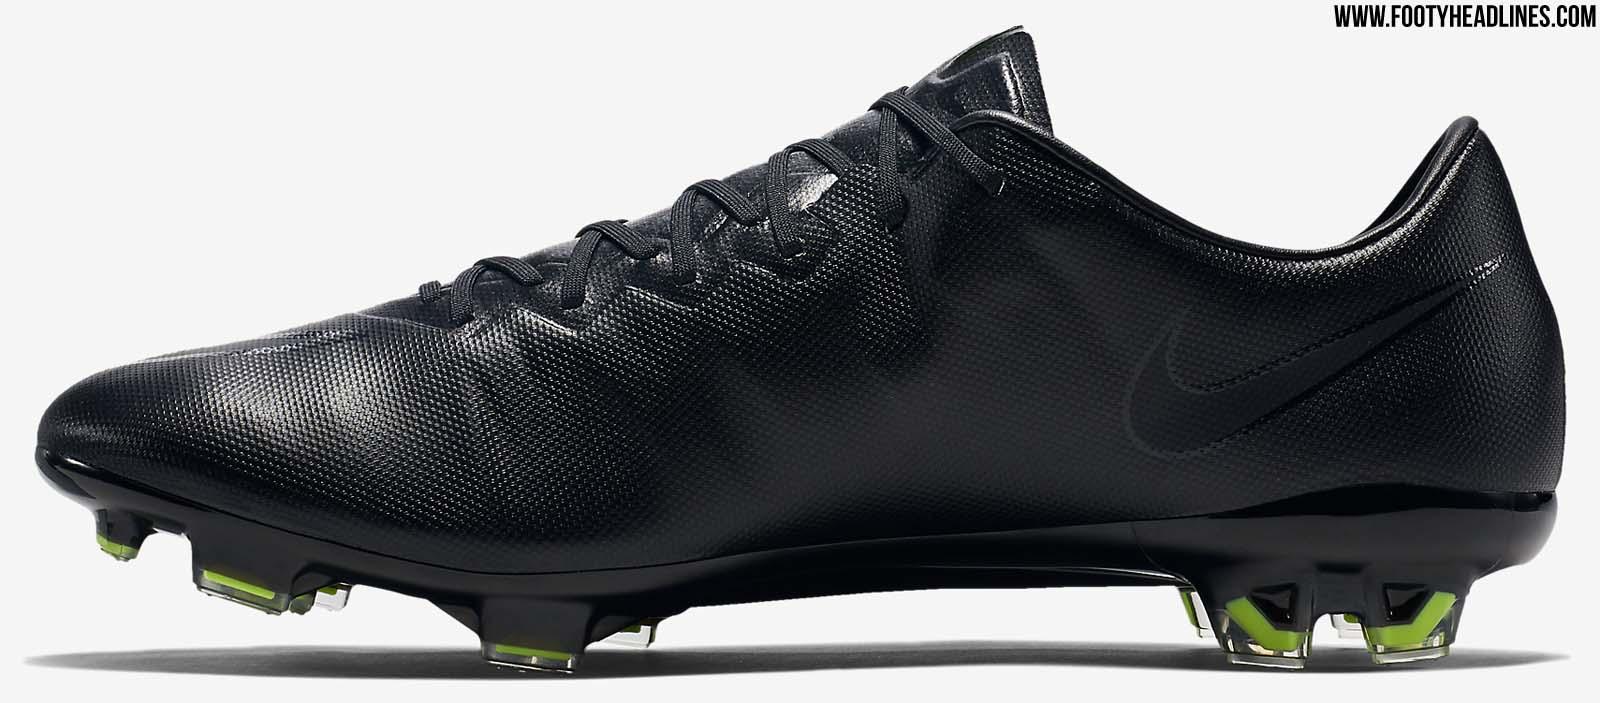 02e59e2ba The Swoosh outline on the new blackout Nike Mercurial Vapor X Soccer Cleats  boasts a reflection ...